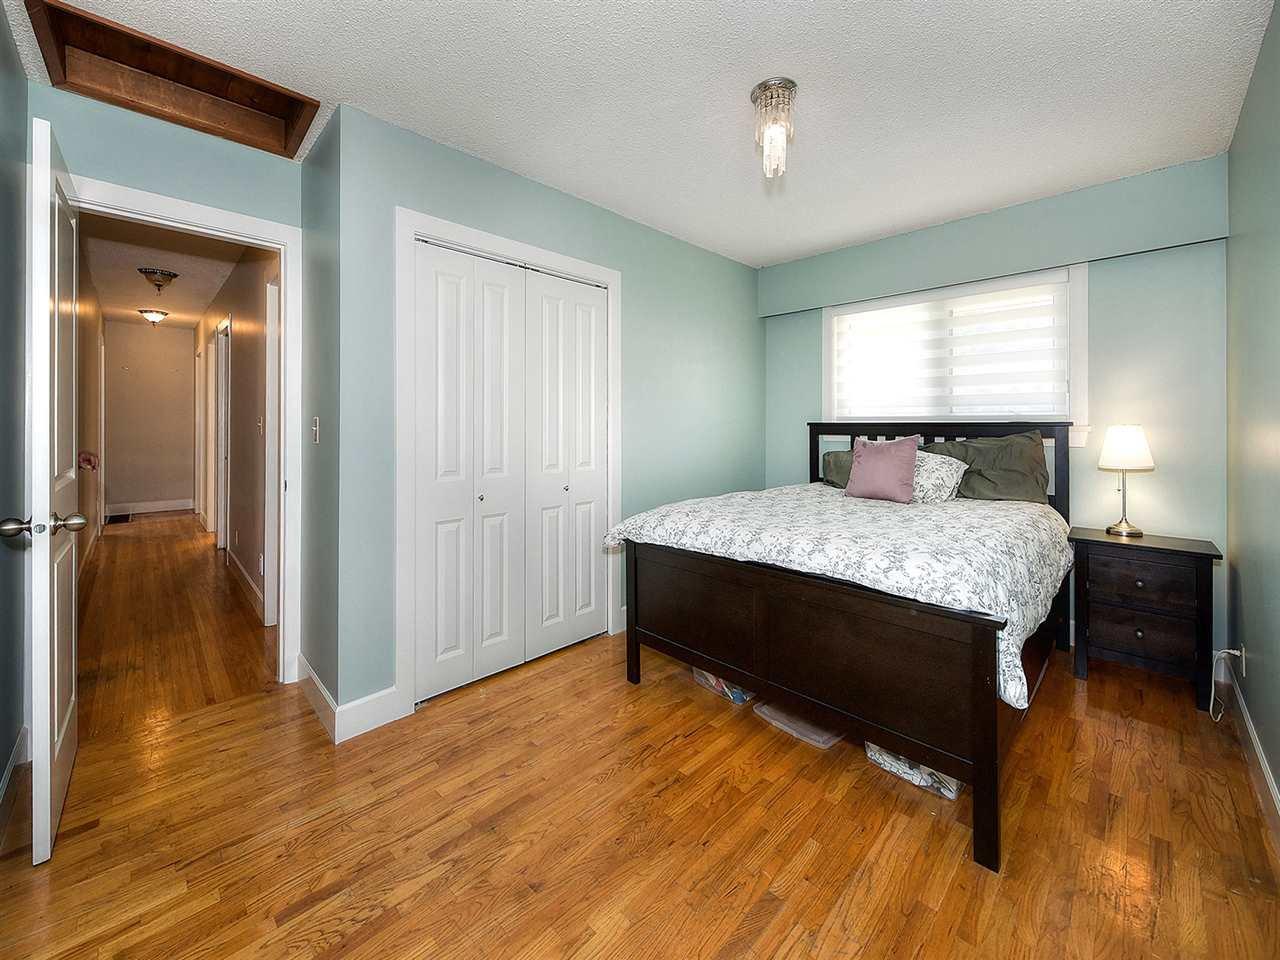 Photo 10: Photos: 1067 WILMINGTON Drive in Delta: Tsawwassen Central House for sale (Tsawwassen)  : MLS®# R2090180